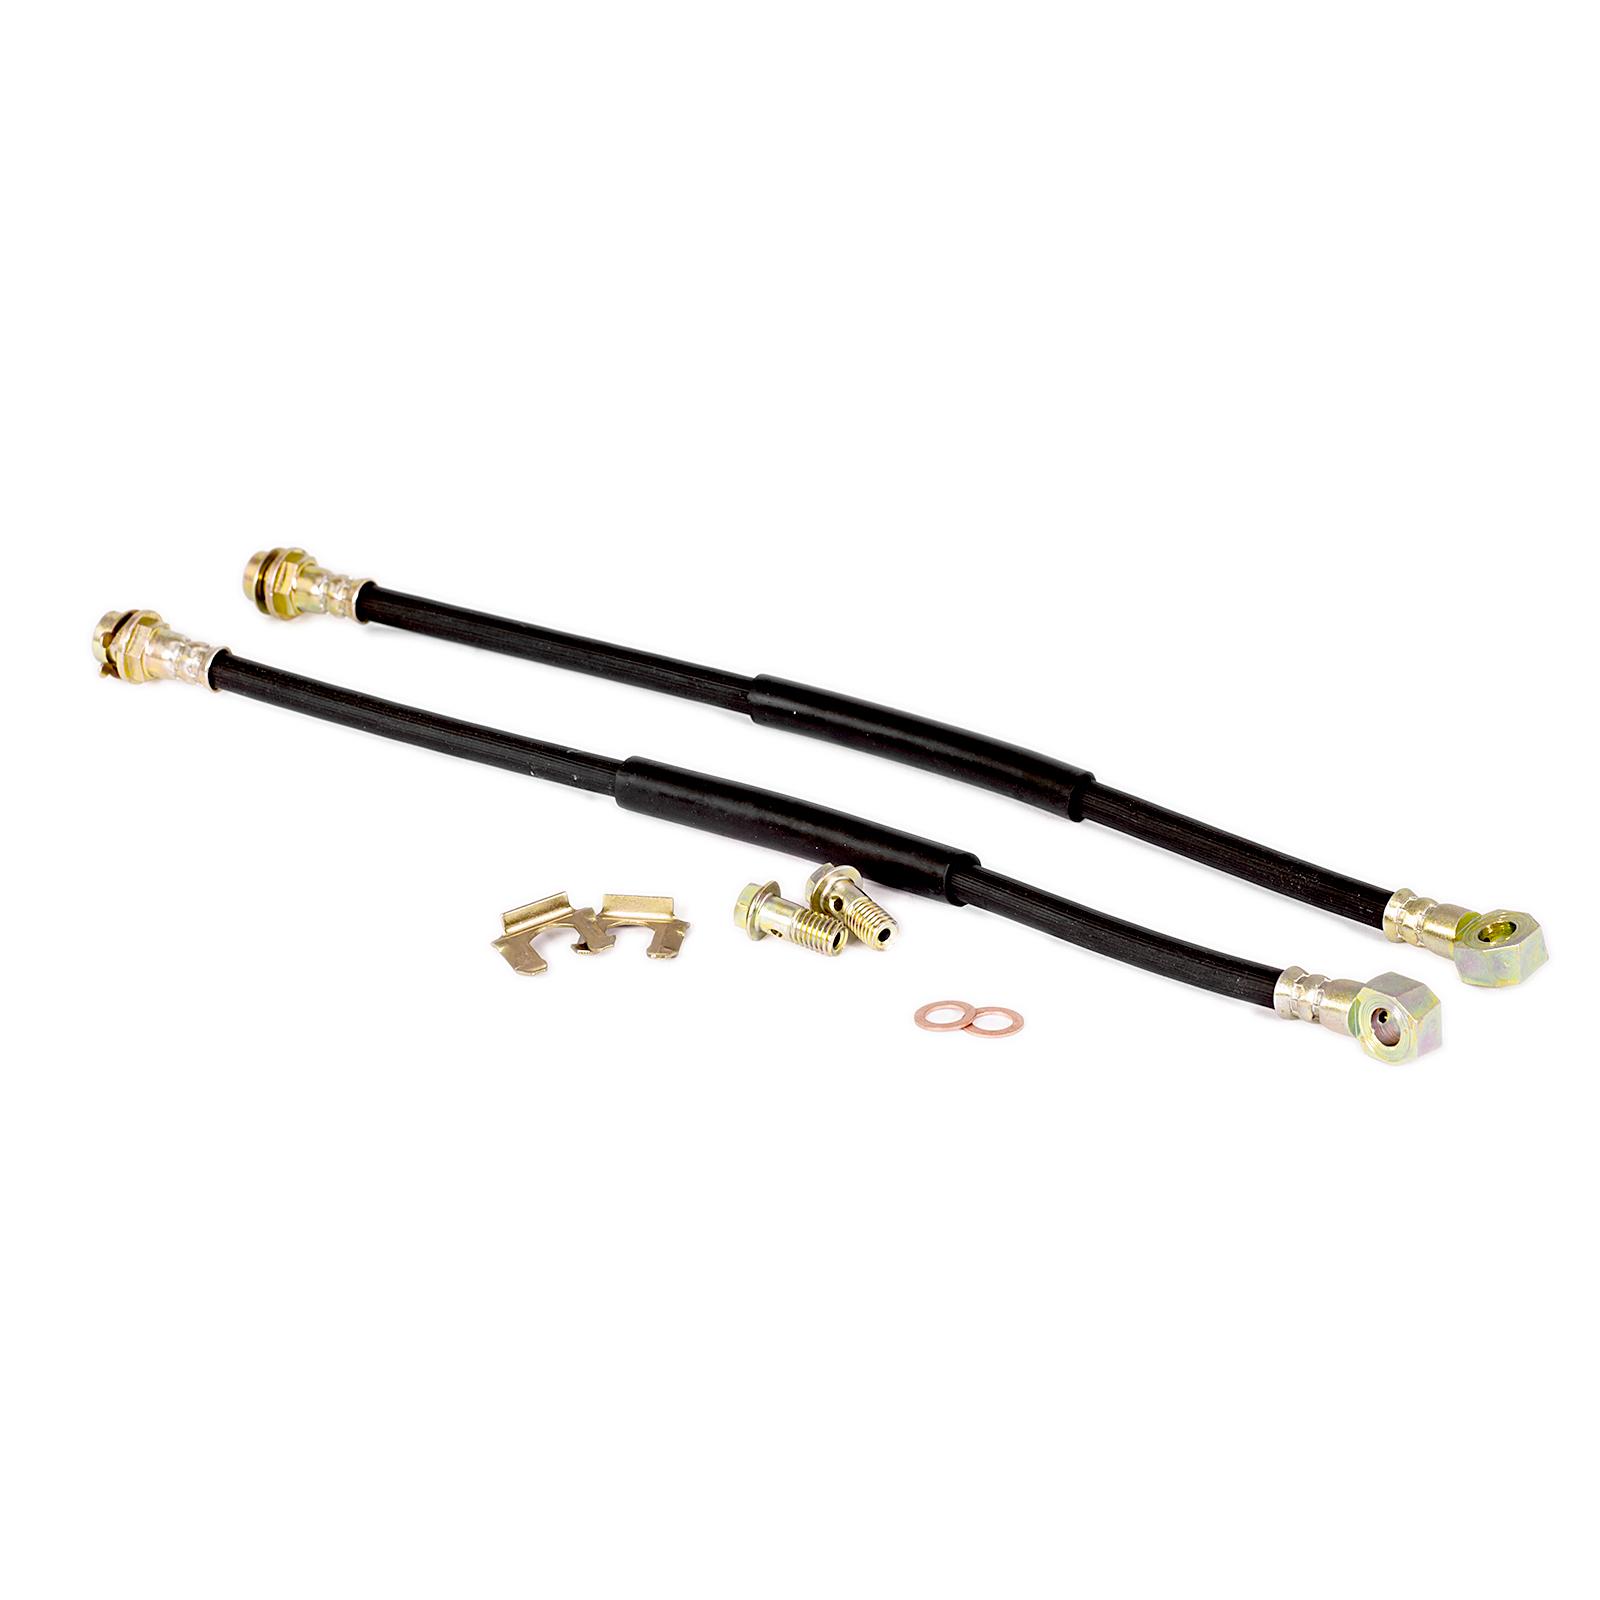 Brake Line Hardware : Mm banjo quot long rubber brake lines with hardware ebay